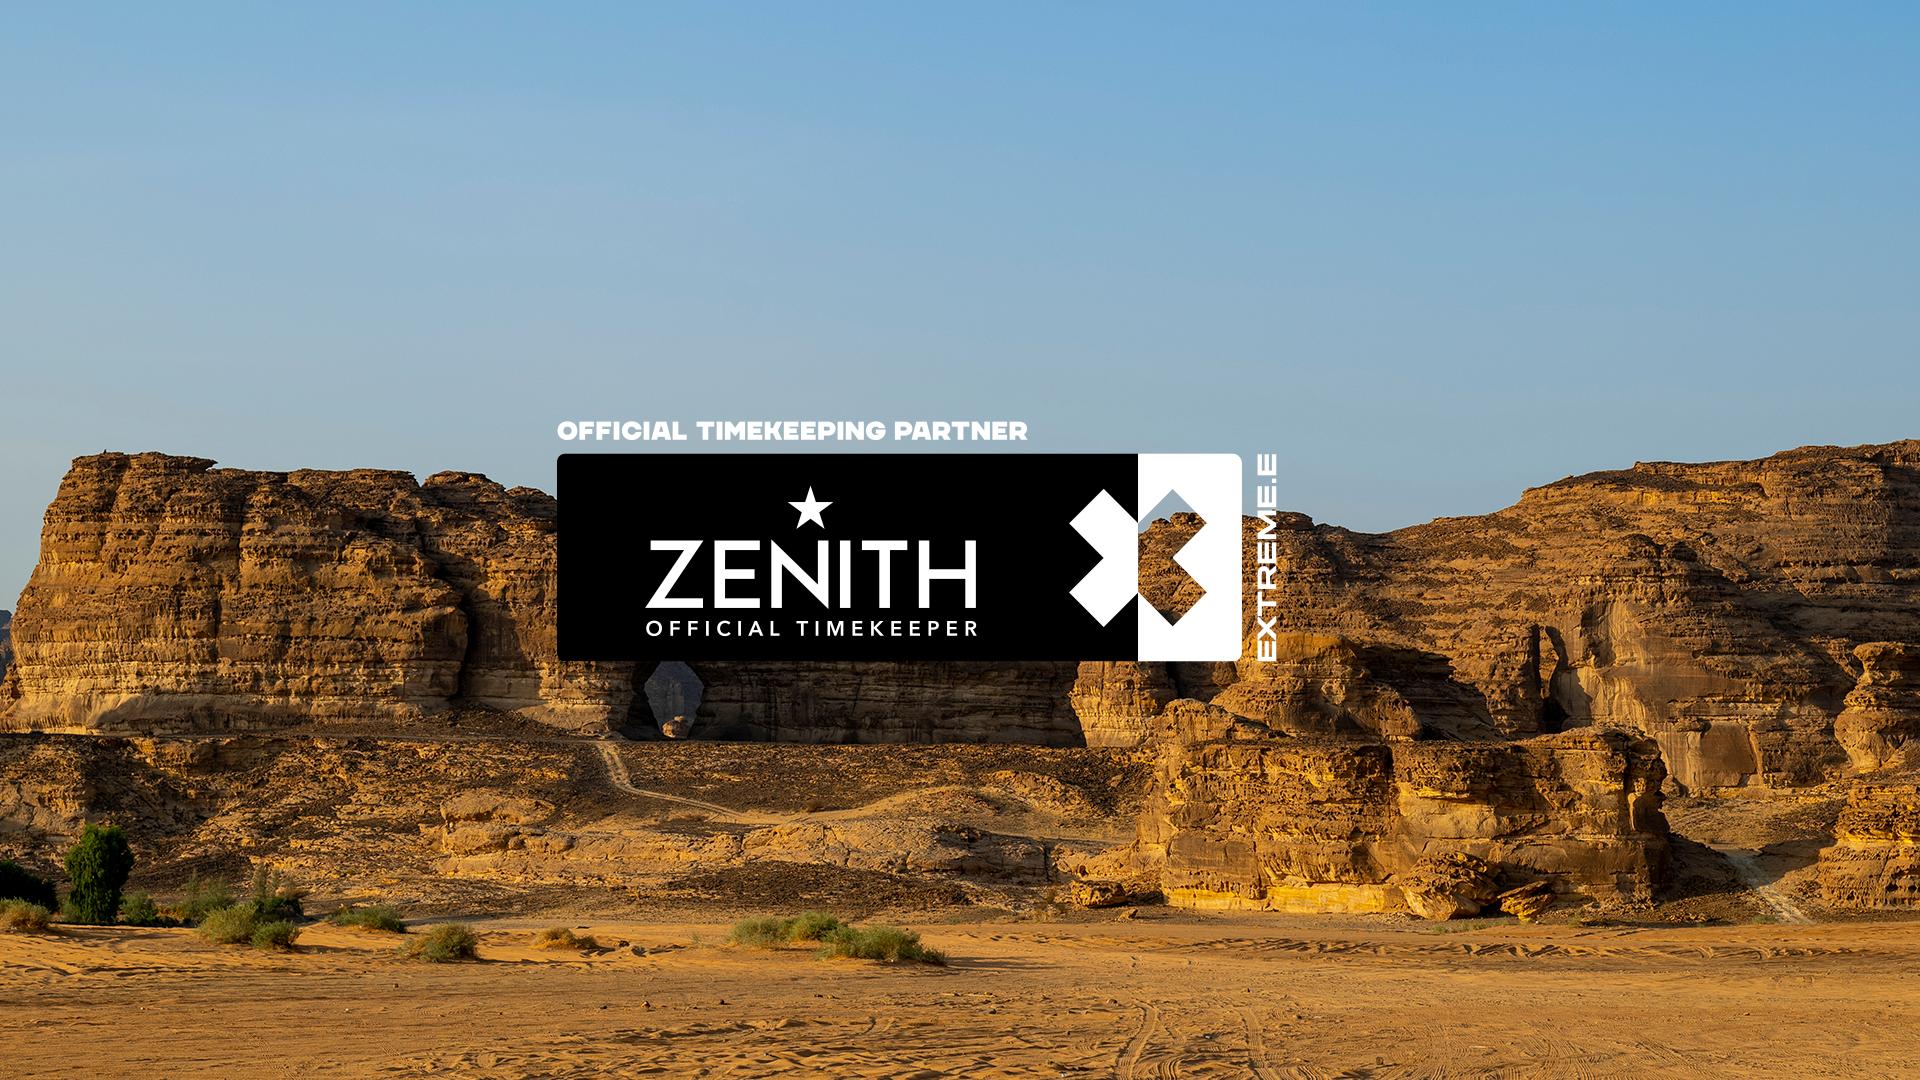 ZENITH_EXTREME-E_OFFICIAL TIMEKEEPER_LOGO (2)